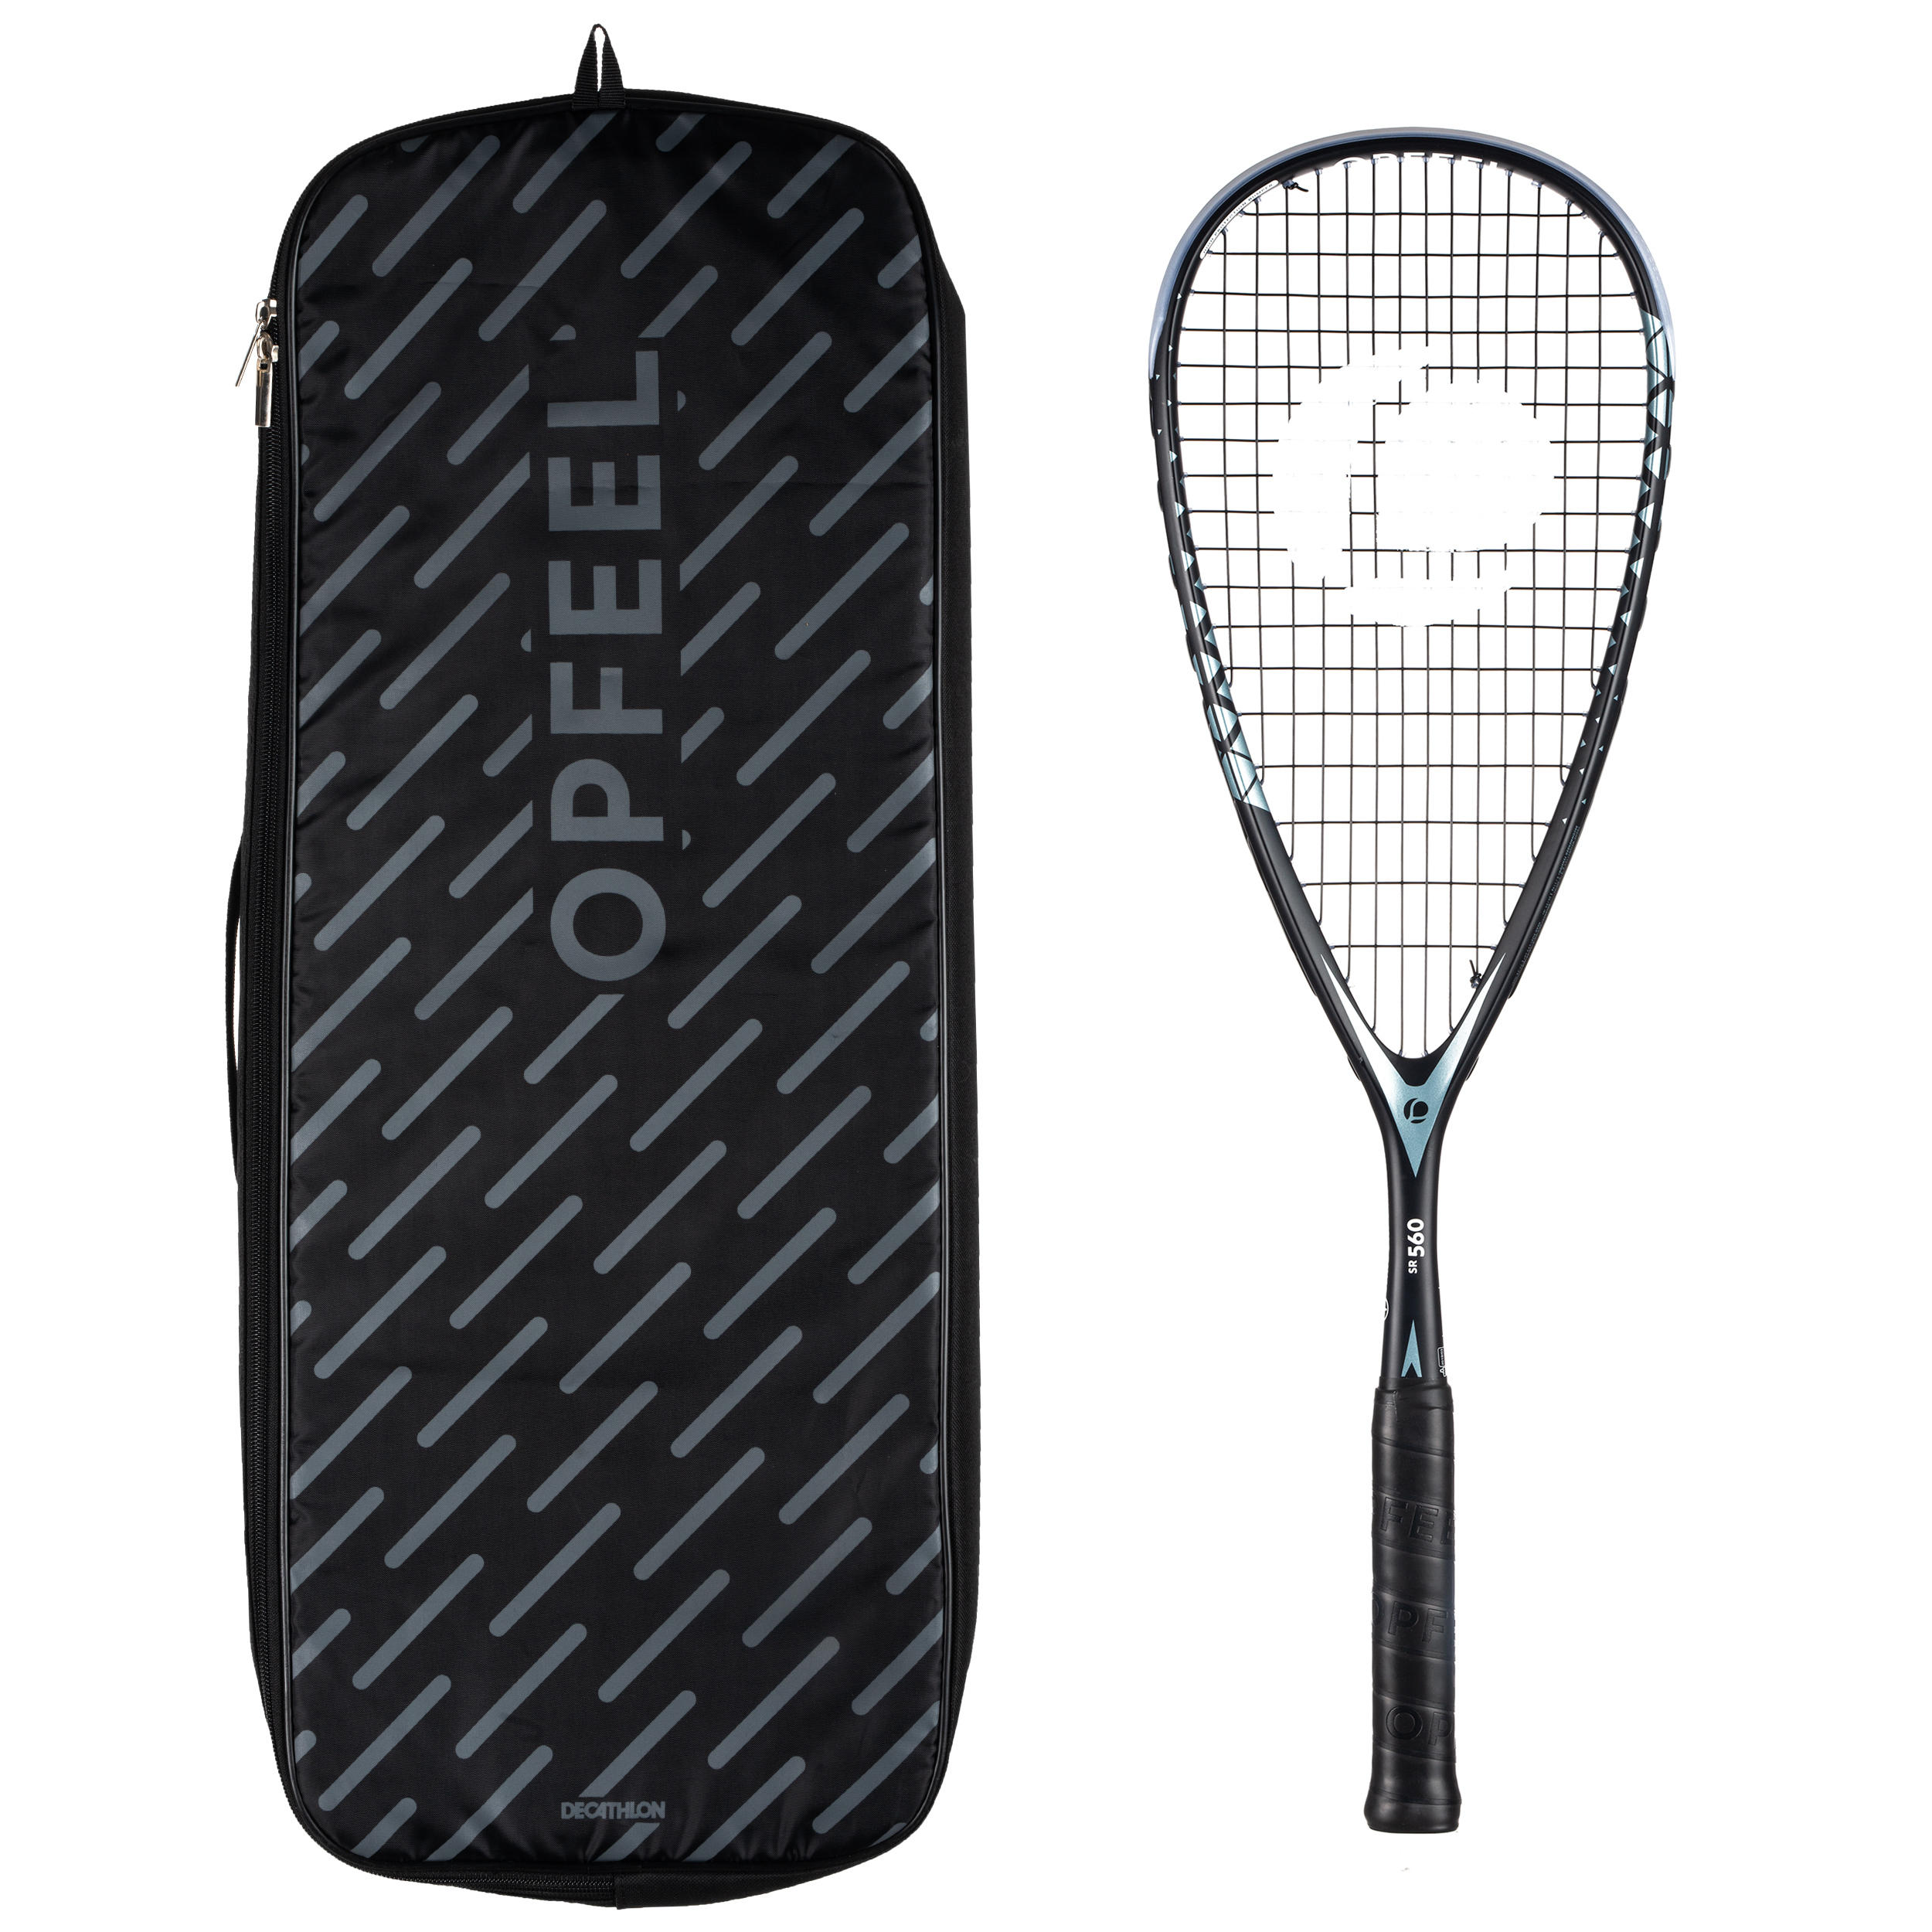 SET rachetă squash SR560 imagine